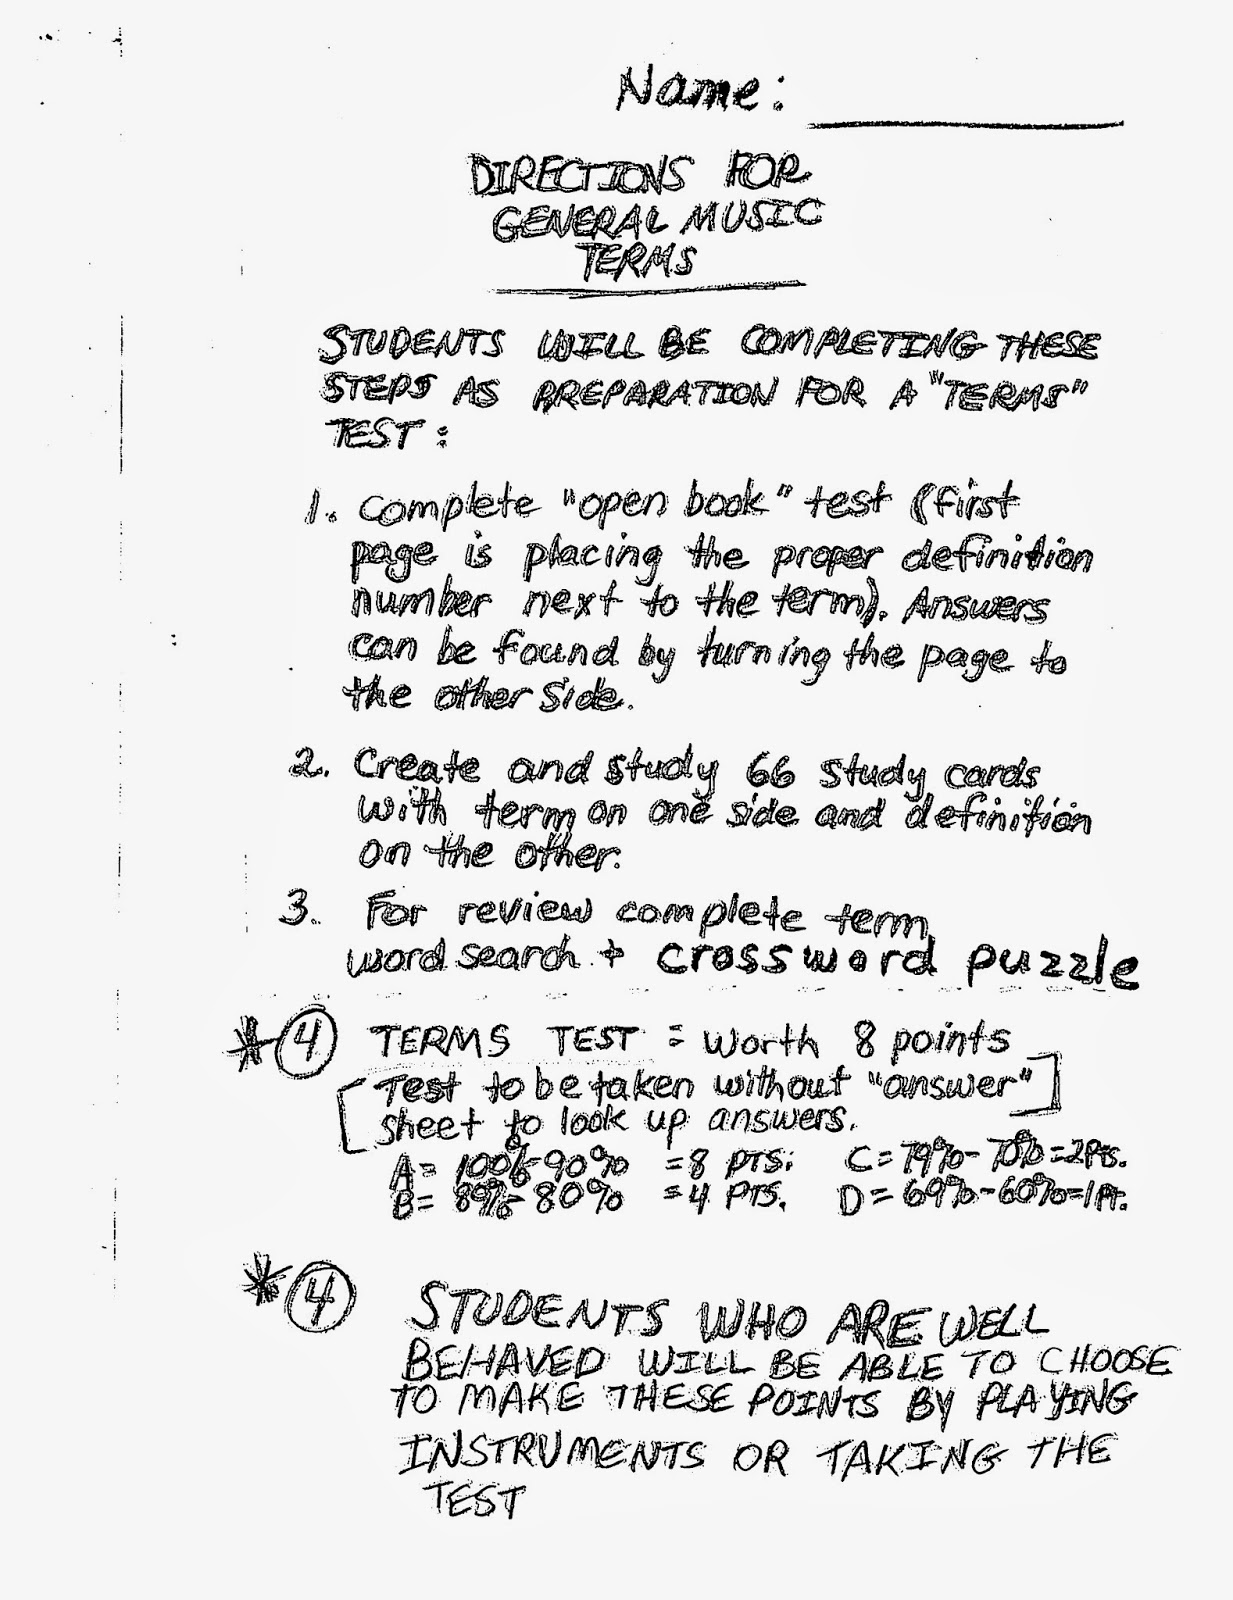 Worksheets Six Pillars Of Character Worksheets six pillars of character worksheets imperialdesignstudio practicalpedal com photographcfo 6 worksheet html